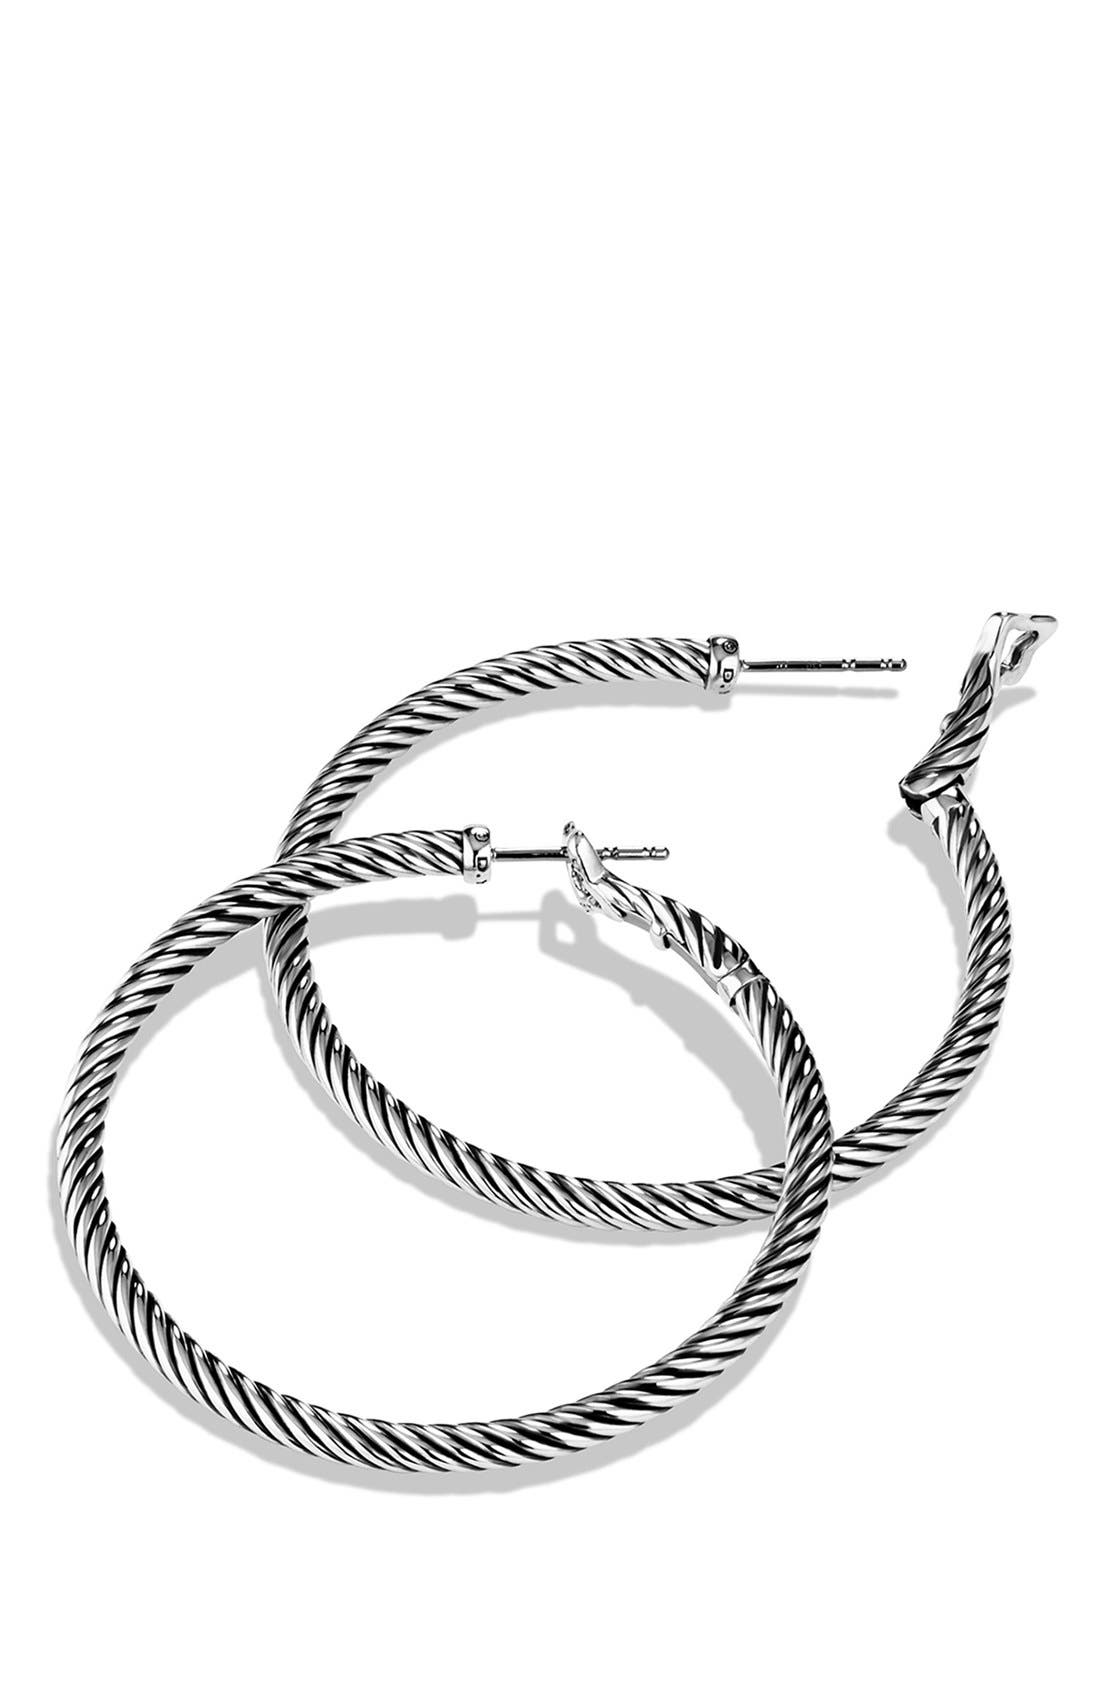 DAVID YURMAN, 'Cable Classics' Large Hoop Earrings, Alternate thumbnail 2, color, SILVER